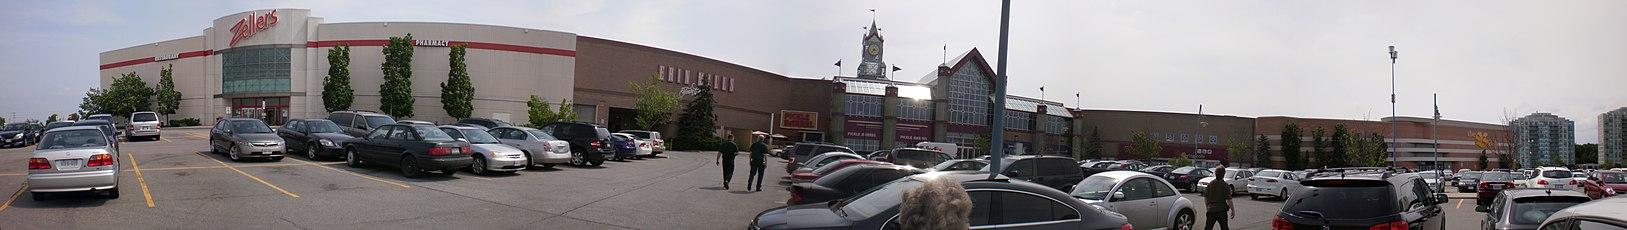 Kaunas Winston Escort Qew Church Canadian Mills Dundas Erin Toronto